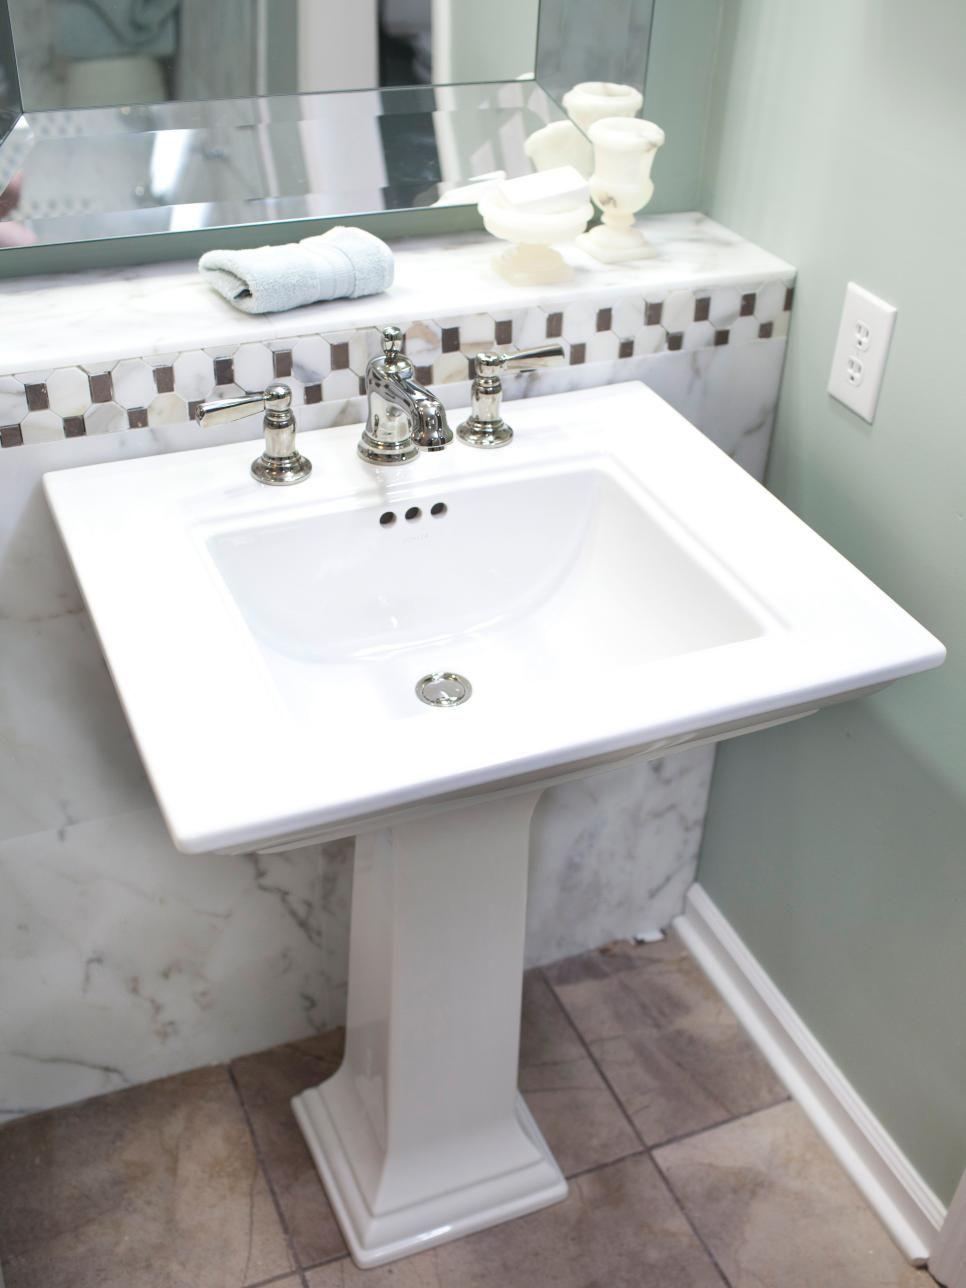 This small bathroom feels spacious thanks to strategic design ...